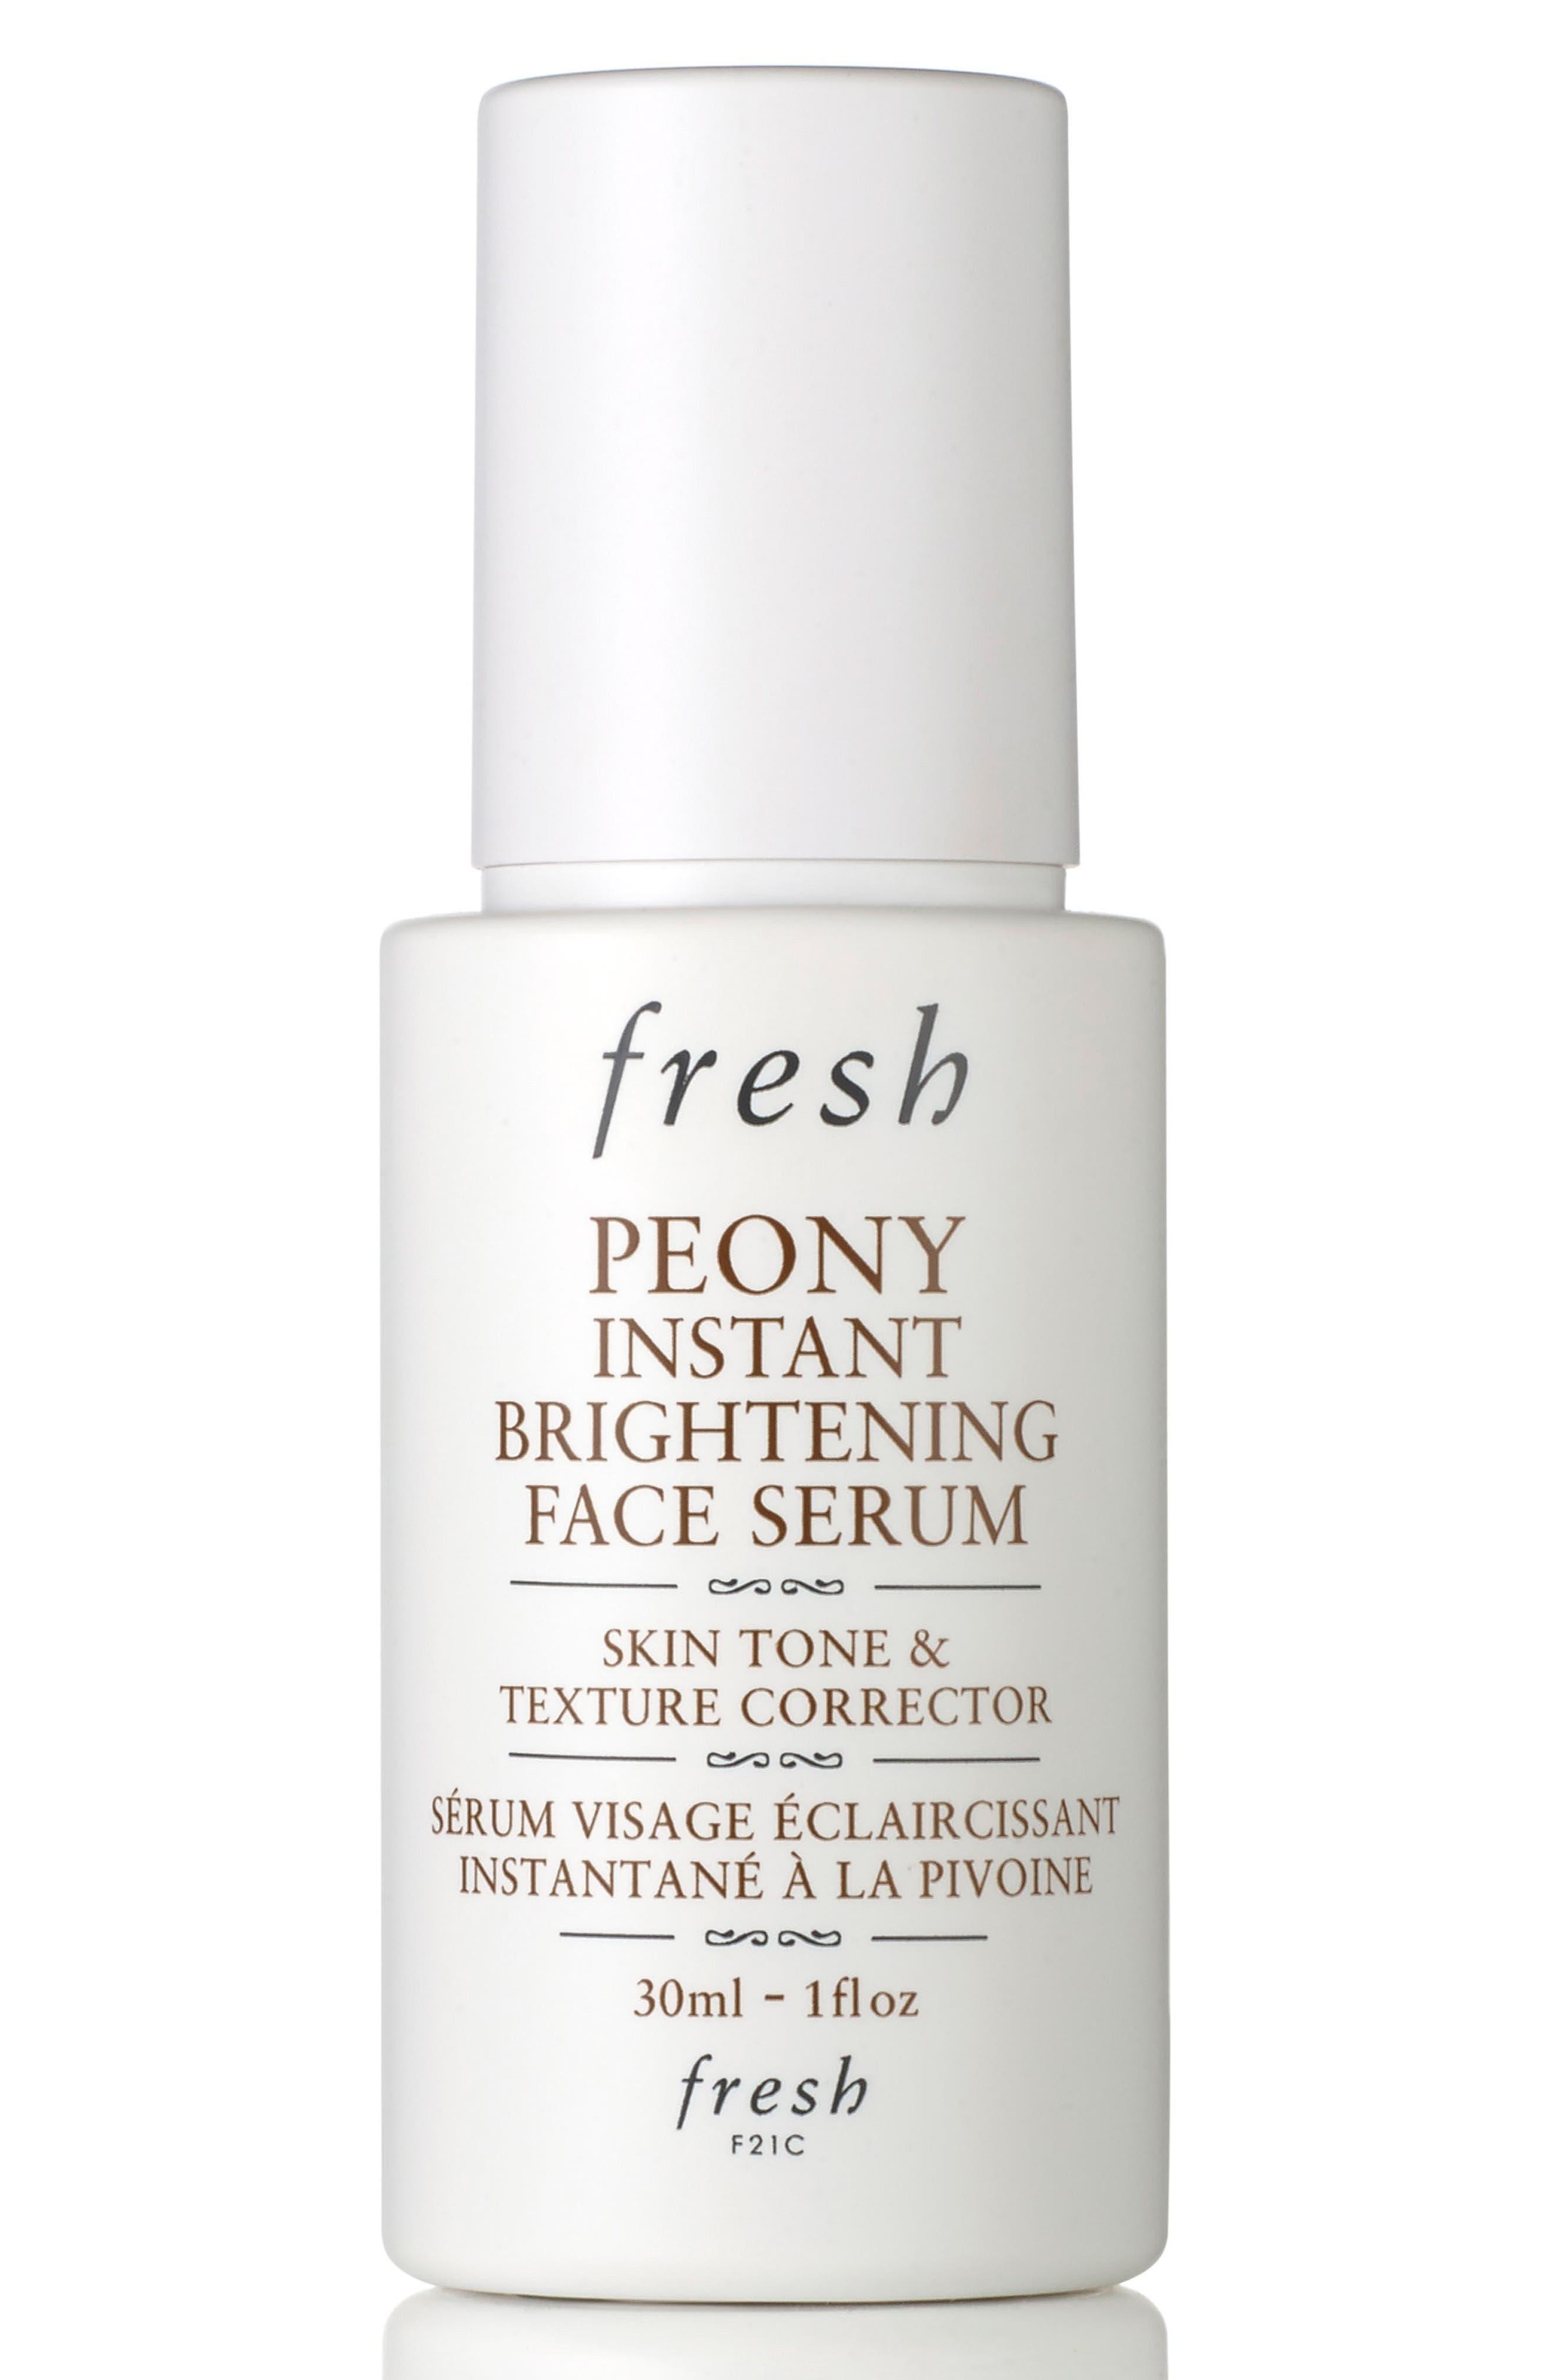 Fresh® Peony Instant Brightening Face Serum